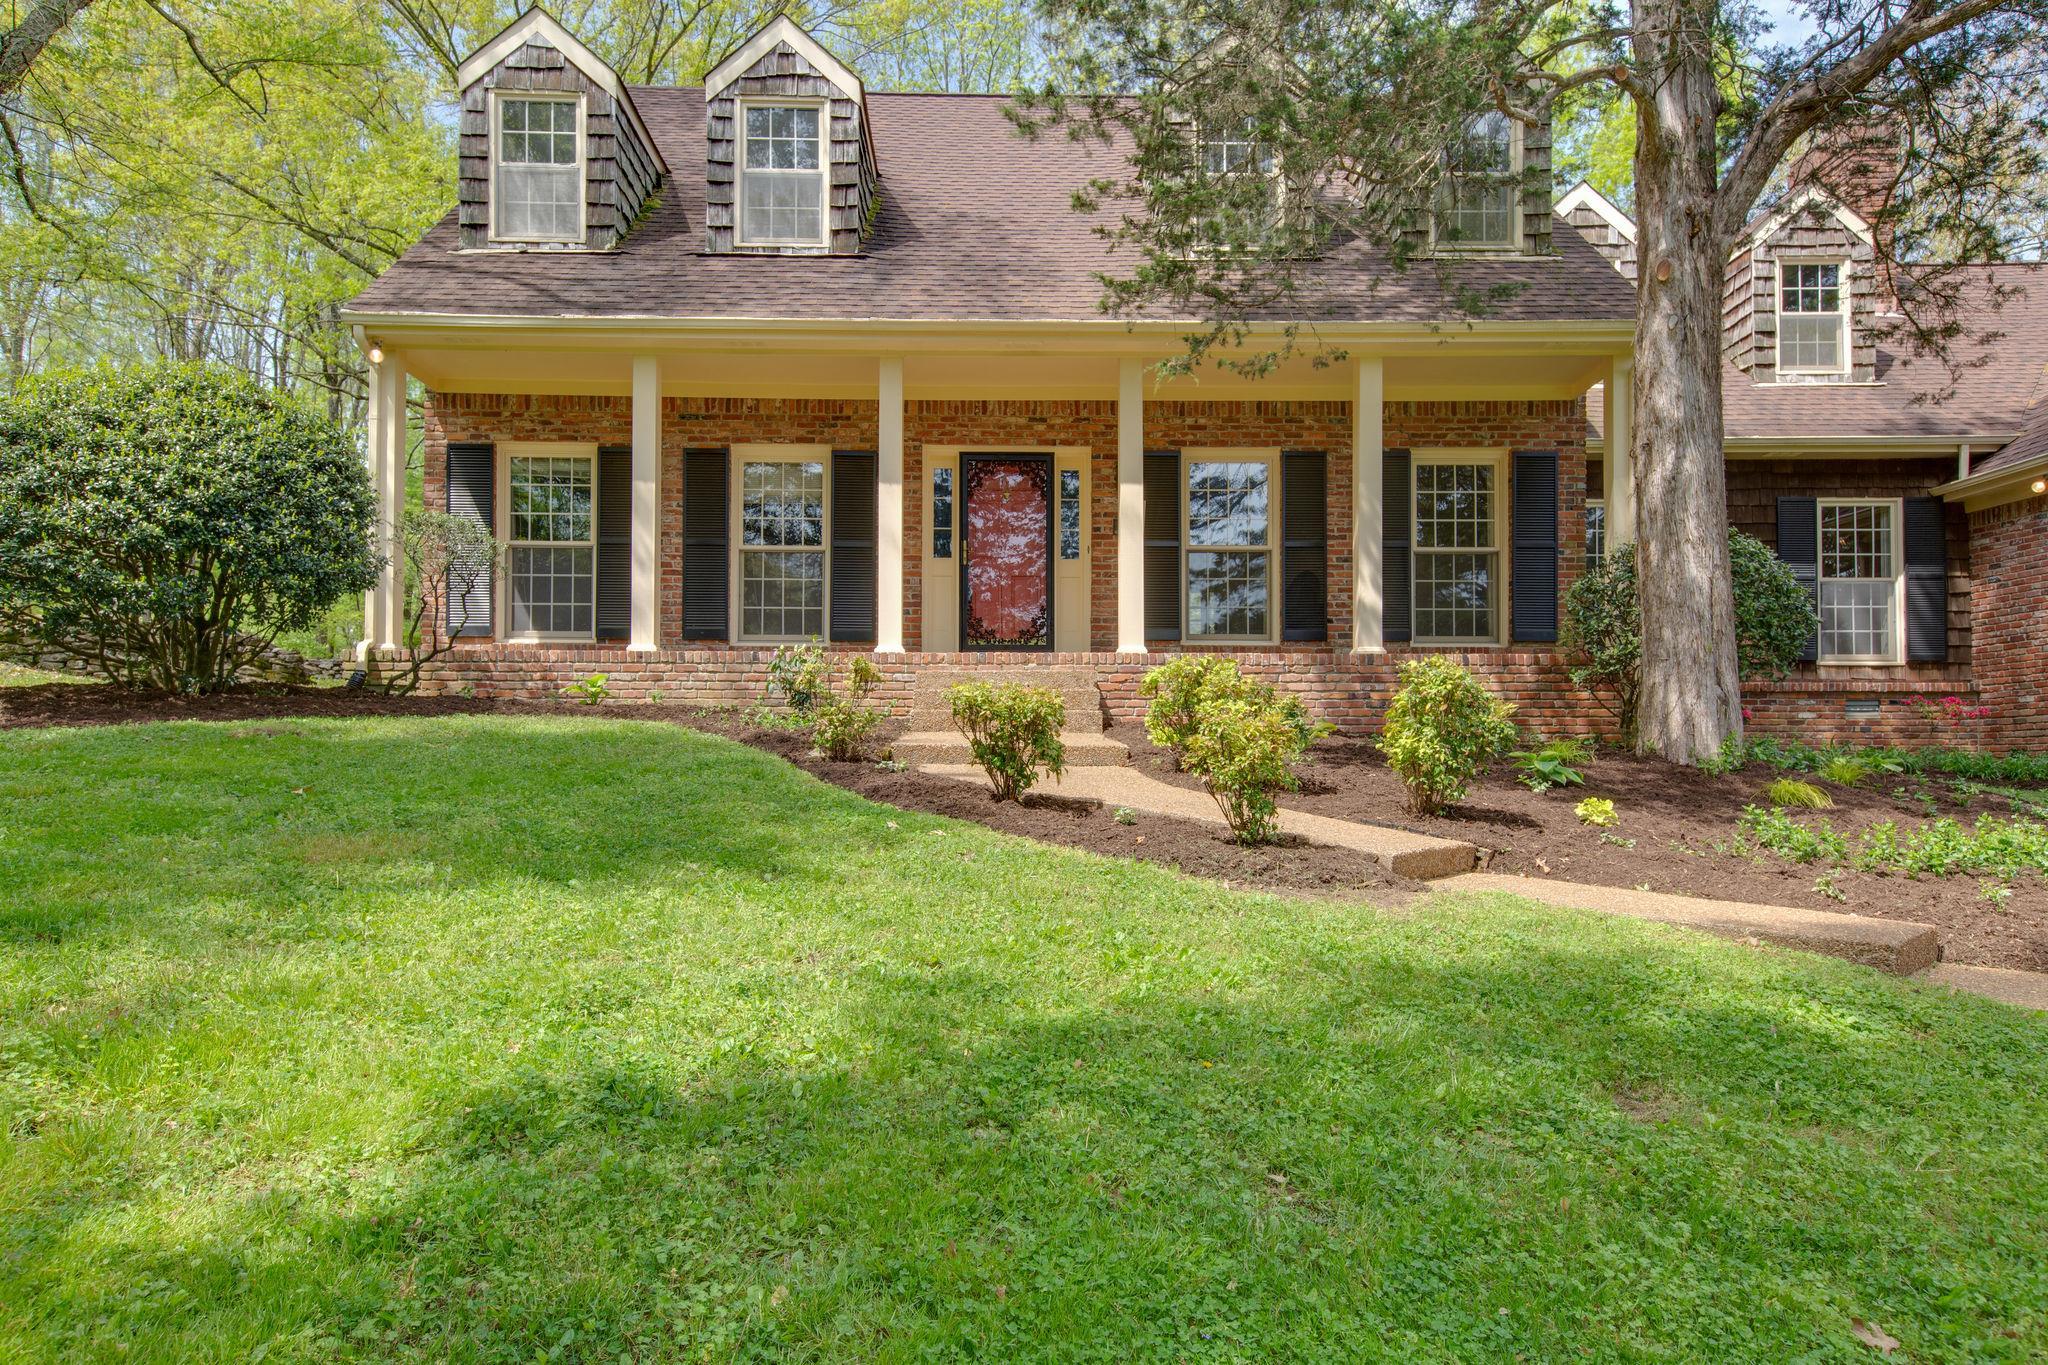 931 Cherry Grove Rd, Franklin, TN 37069 - Franklin, TN real estate listing